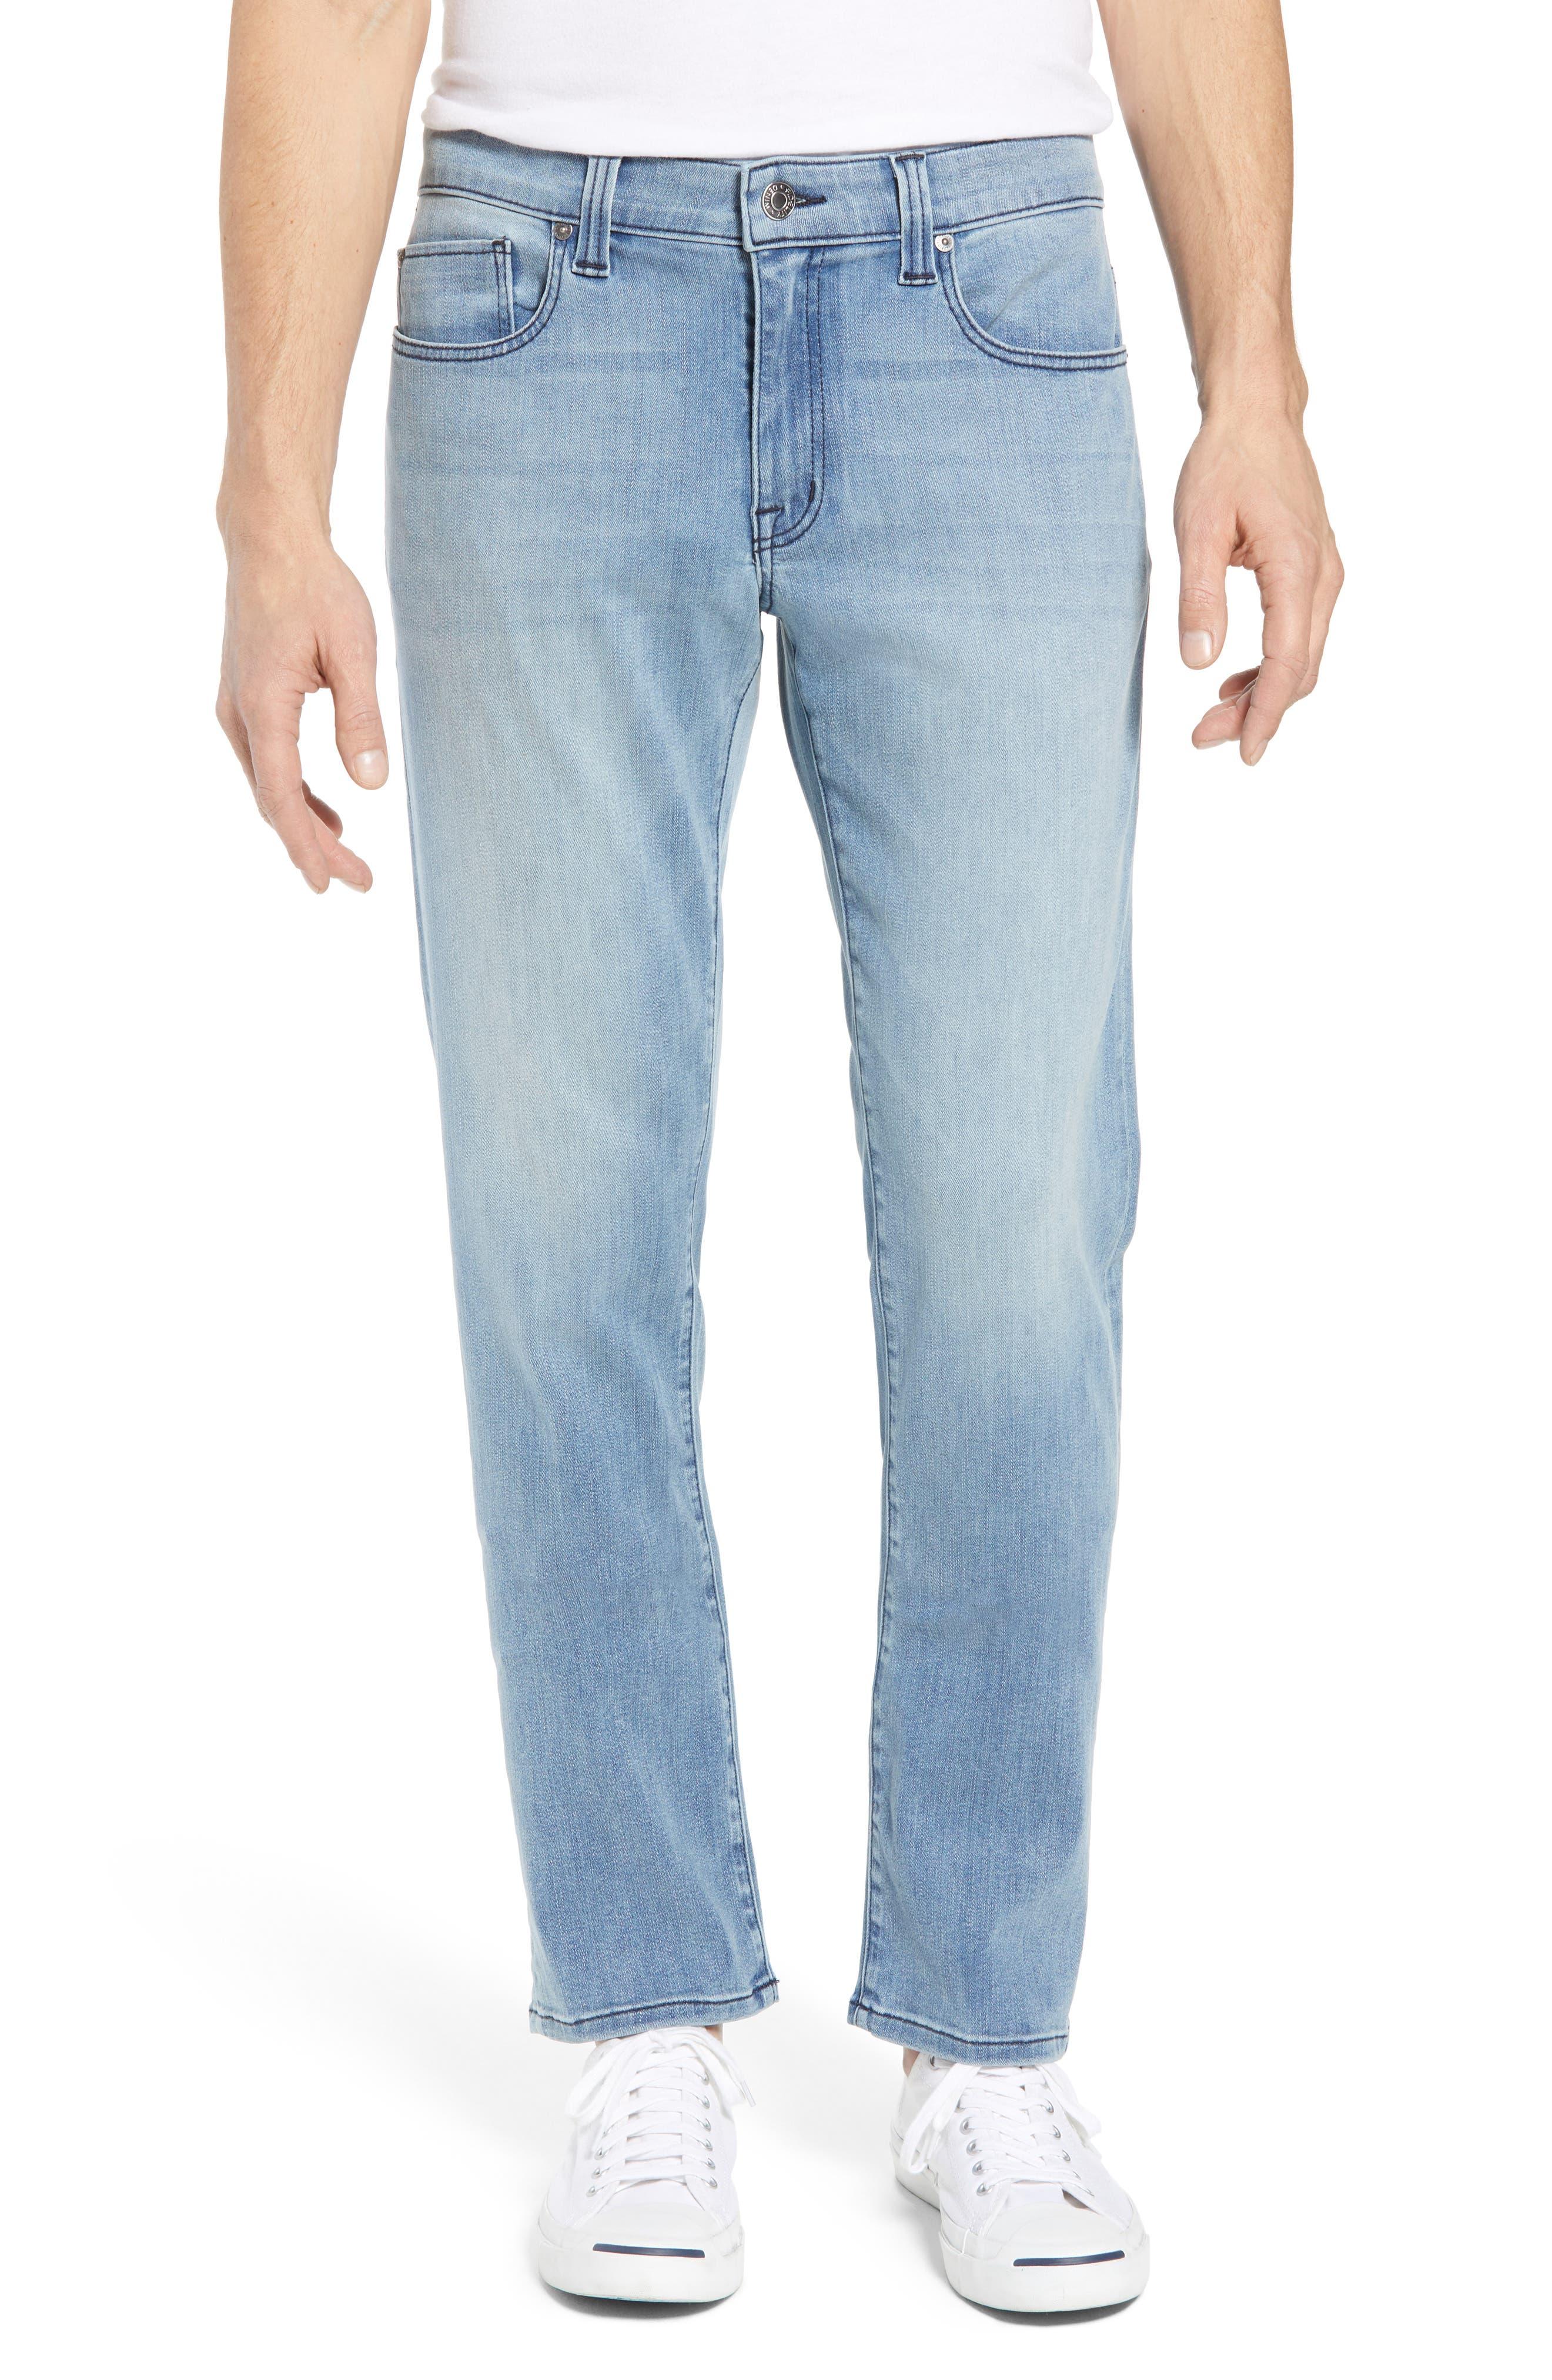 Jimmy Slim Straight Leg Jeans,                         Main,                         color, Abbey Blue